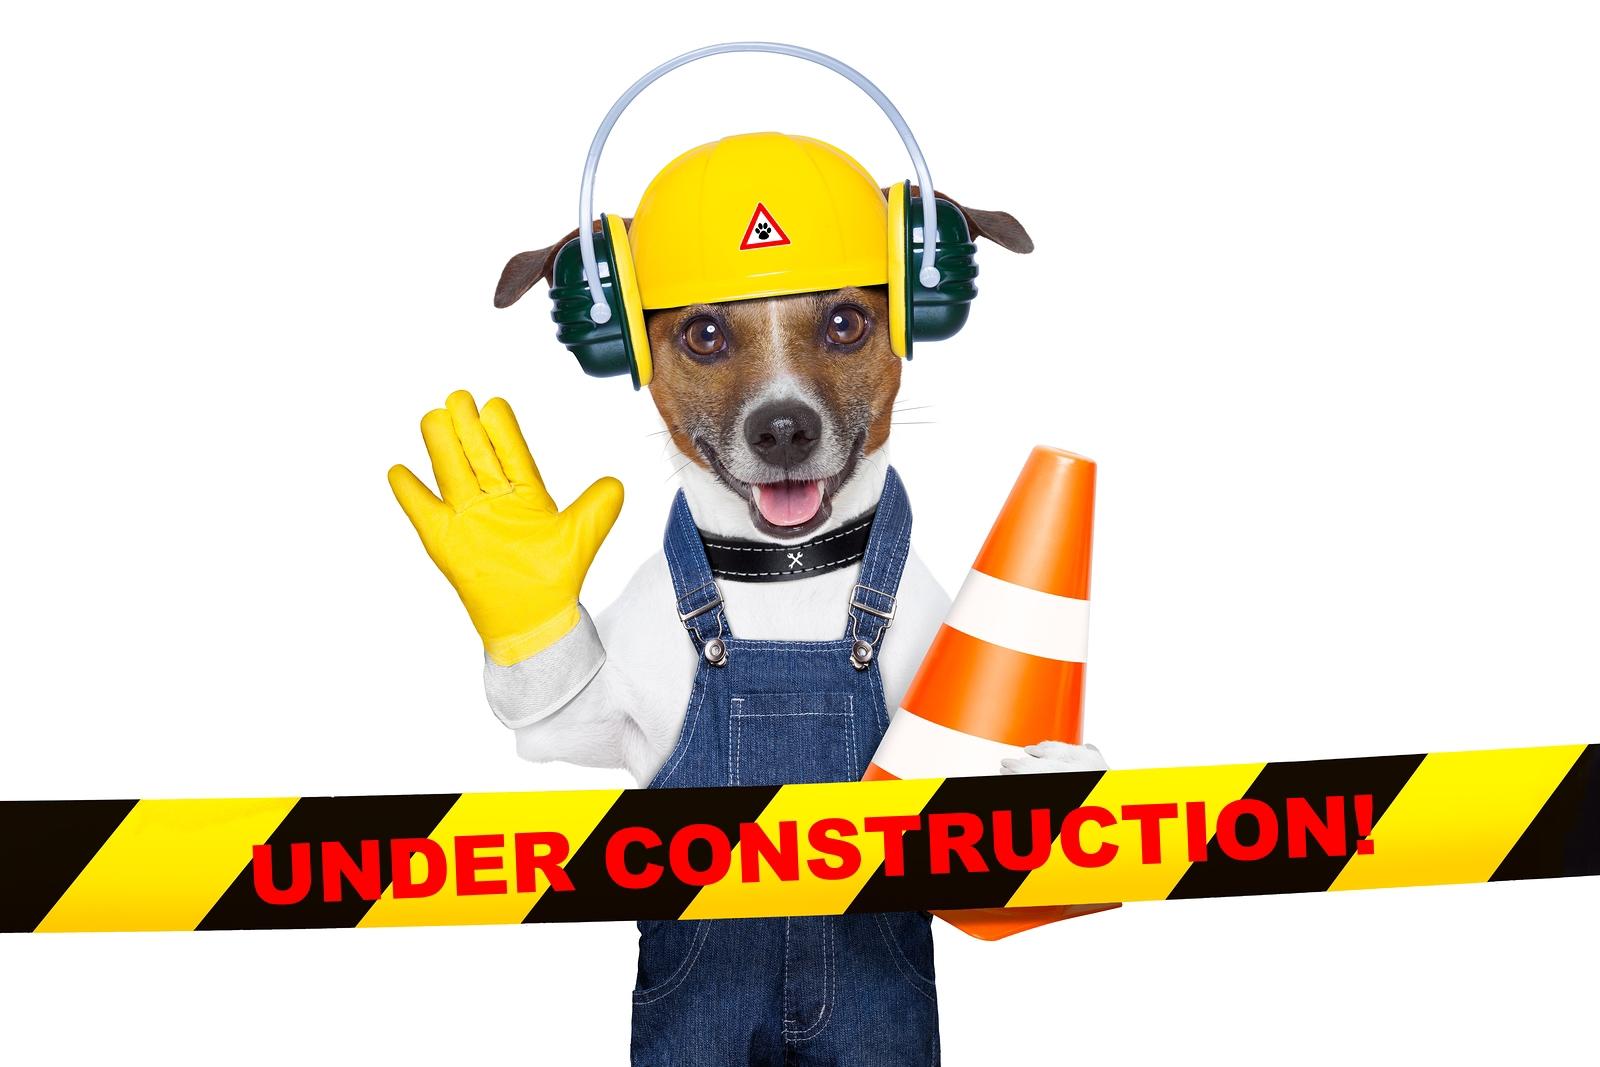 bigstock-Under-Construction-Dog-47595958.jpg